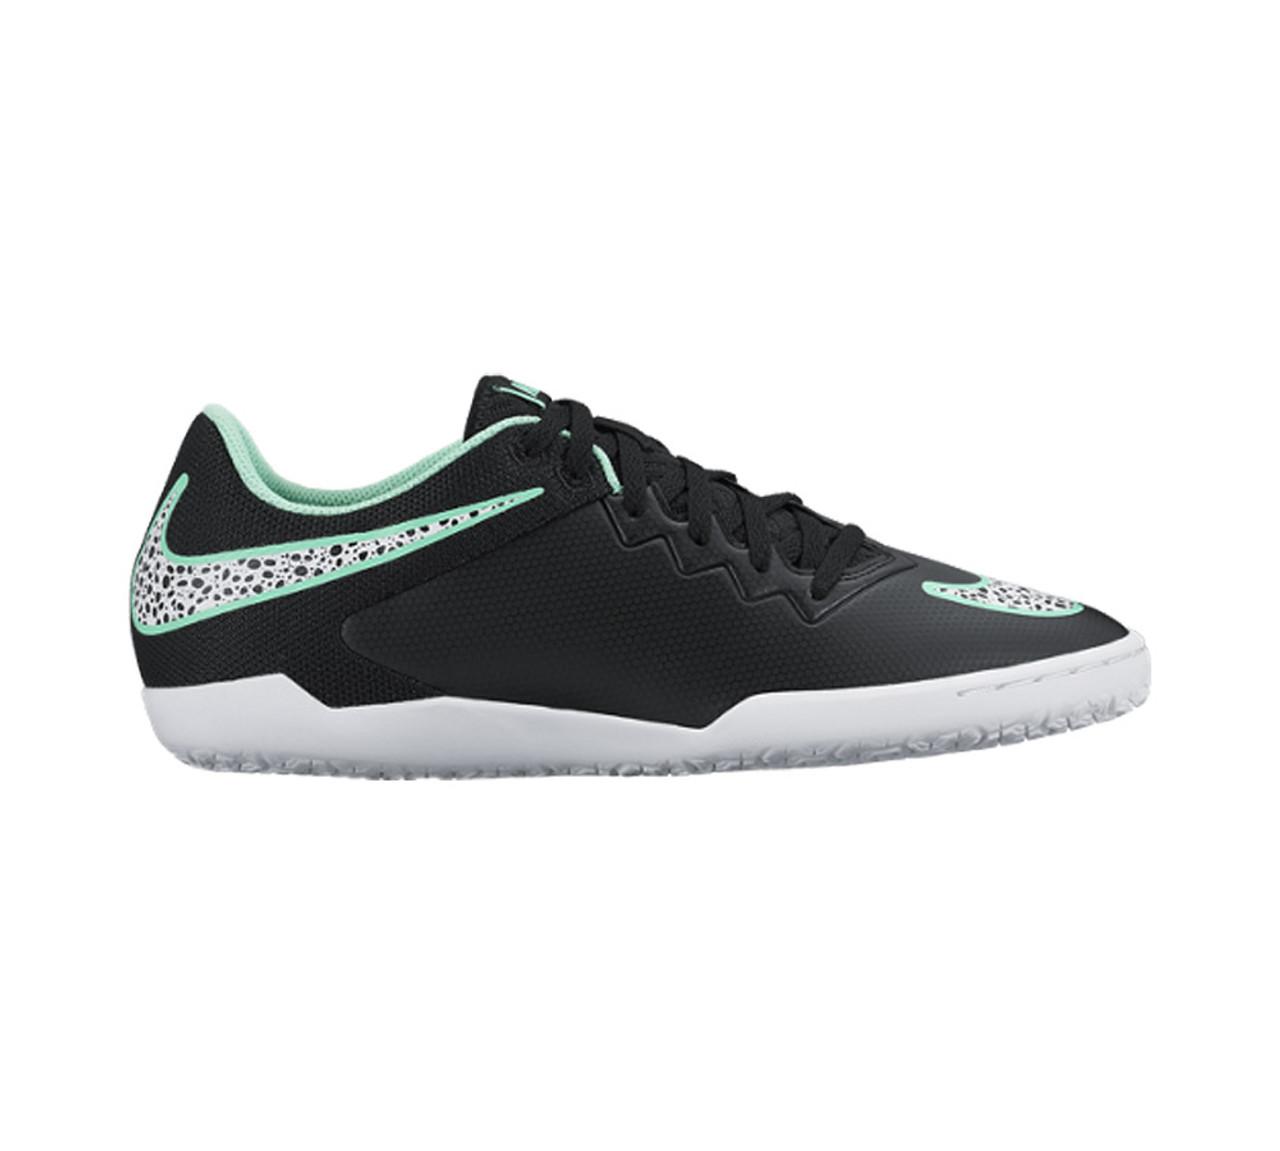 7a233c23df1 Nike Men s Hypervenomx Pro IC Soccer Shoe Black Green - Shop now   Shoolu.